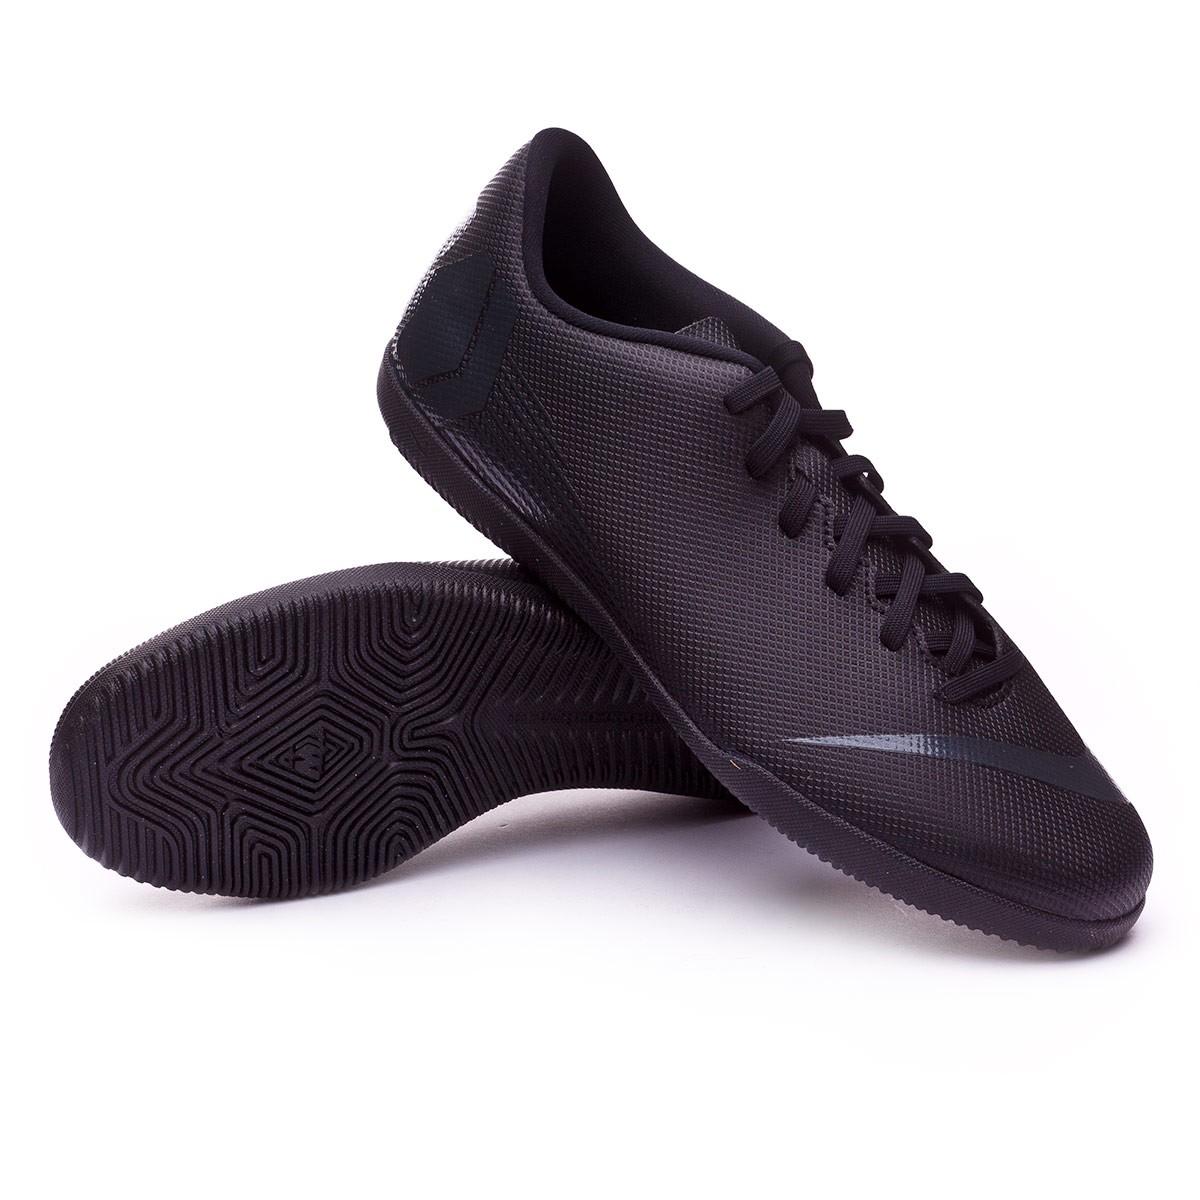 timeless design 0dd16 cc6ff Futsal Boot Nike Mercurial Vapor XII Club IC Black - Football store ...